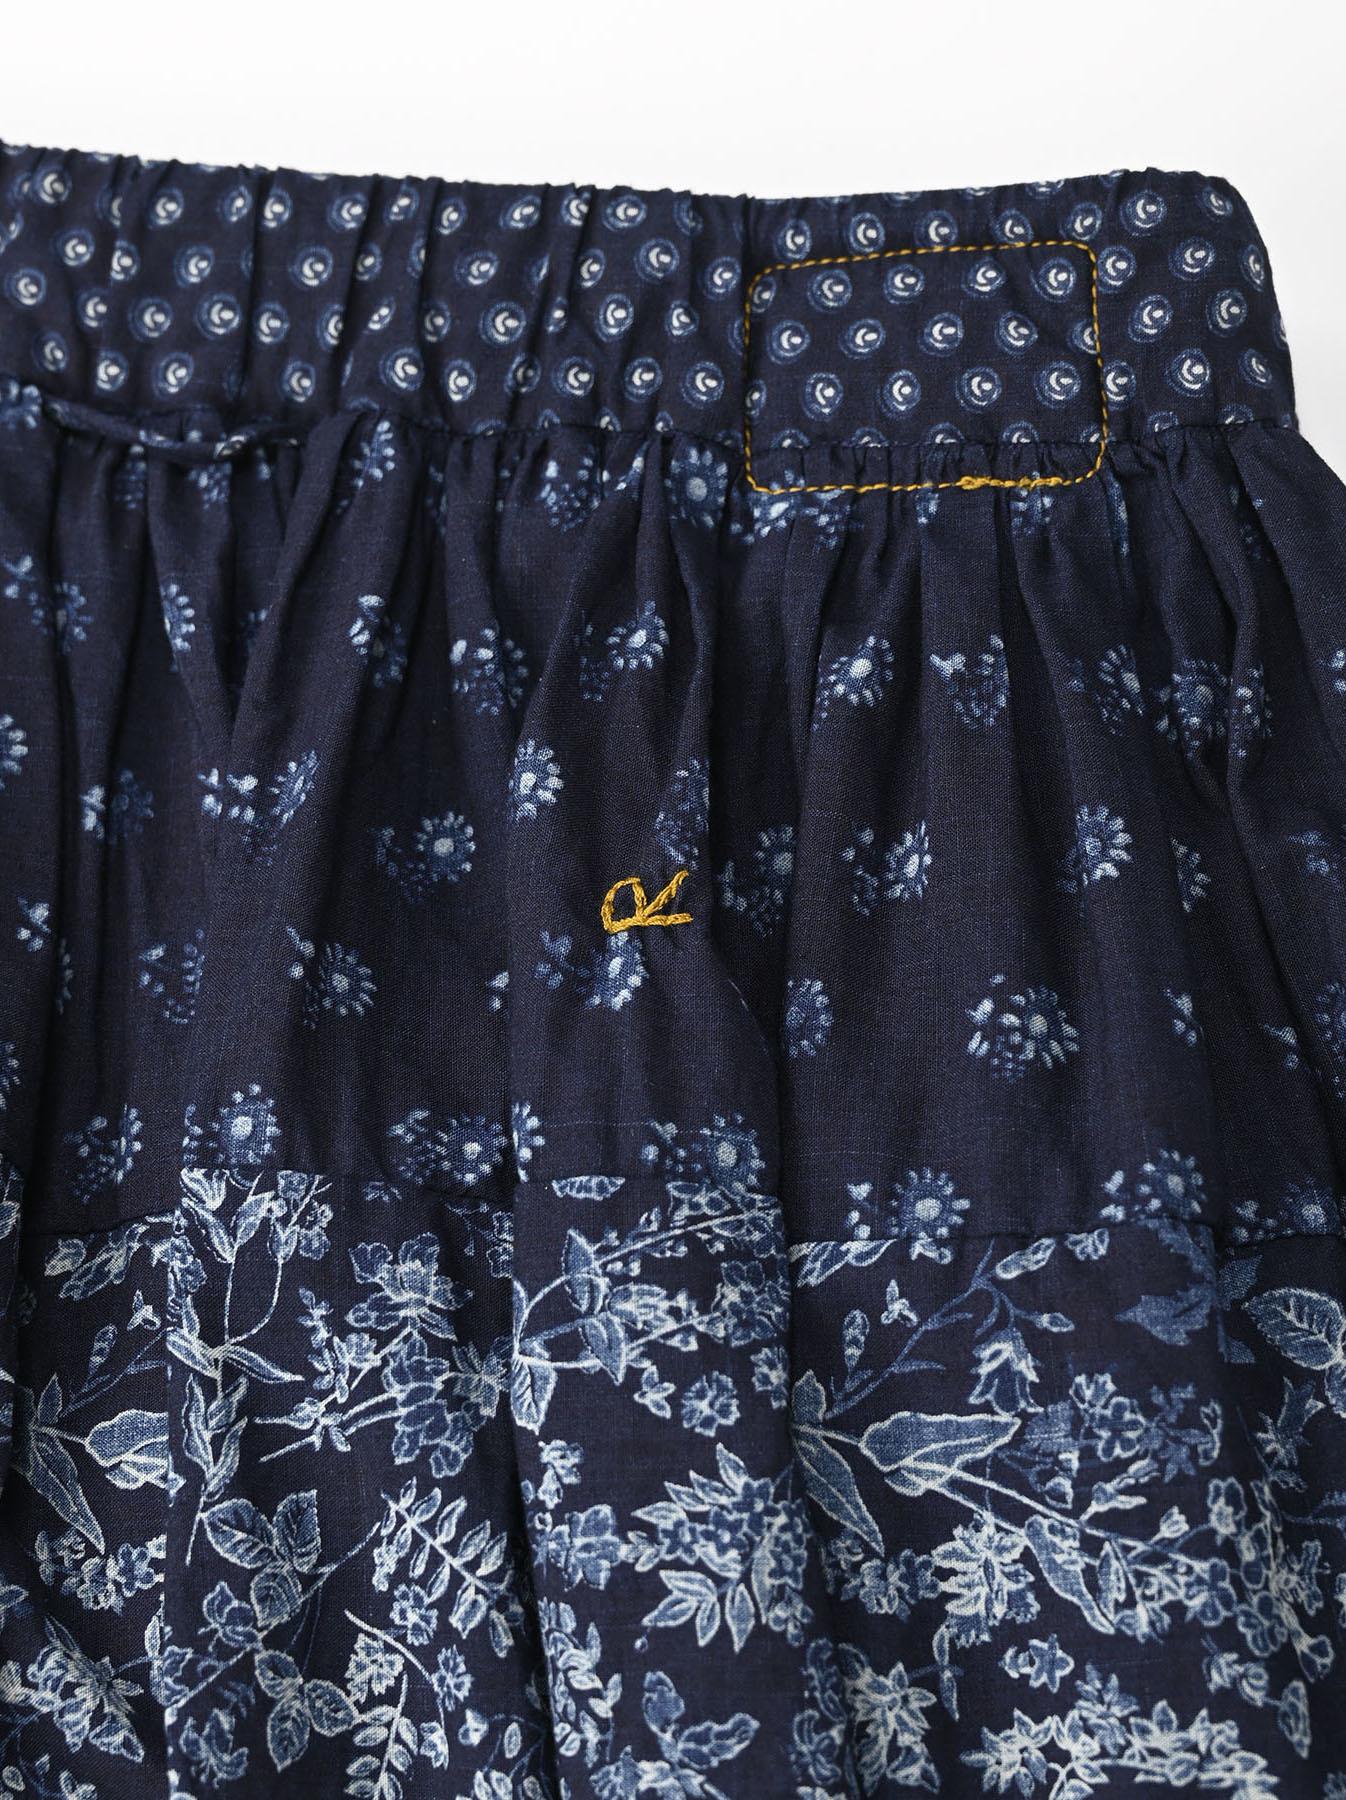 Indigo Tappet Flower Patchwork Skirt-9